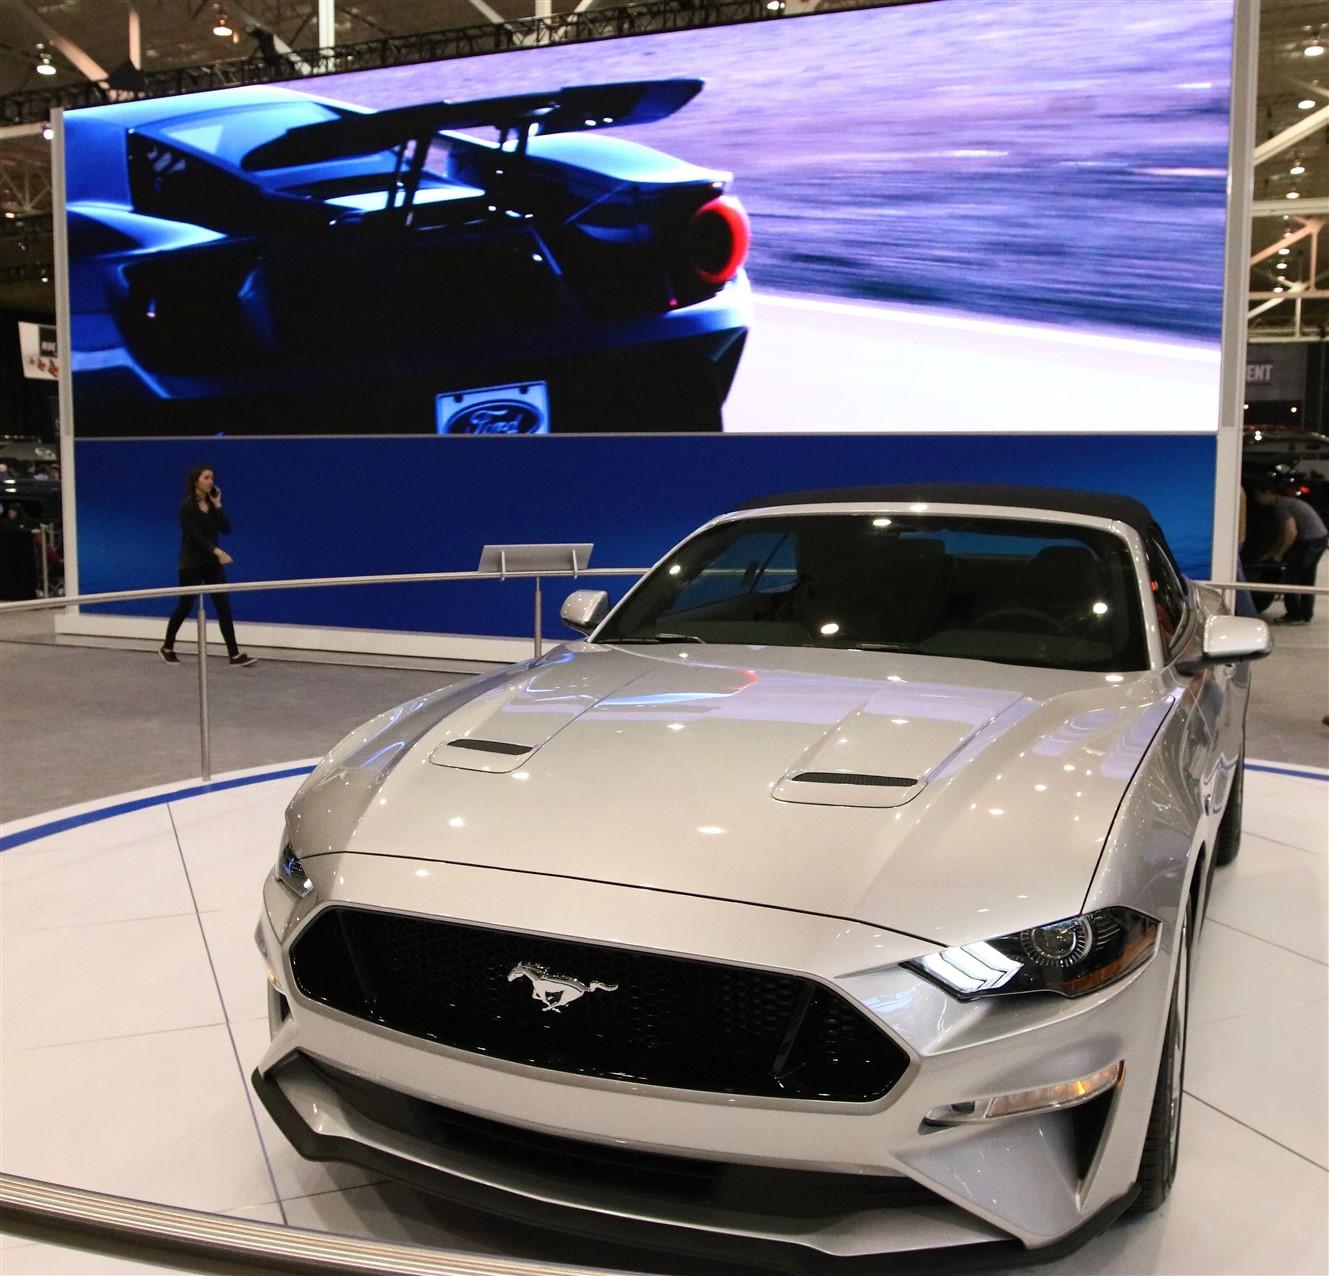 2017 02 26 117 Cleveland IX Center New Car Show.jpg